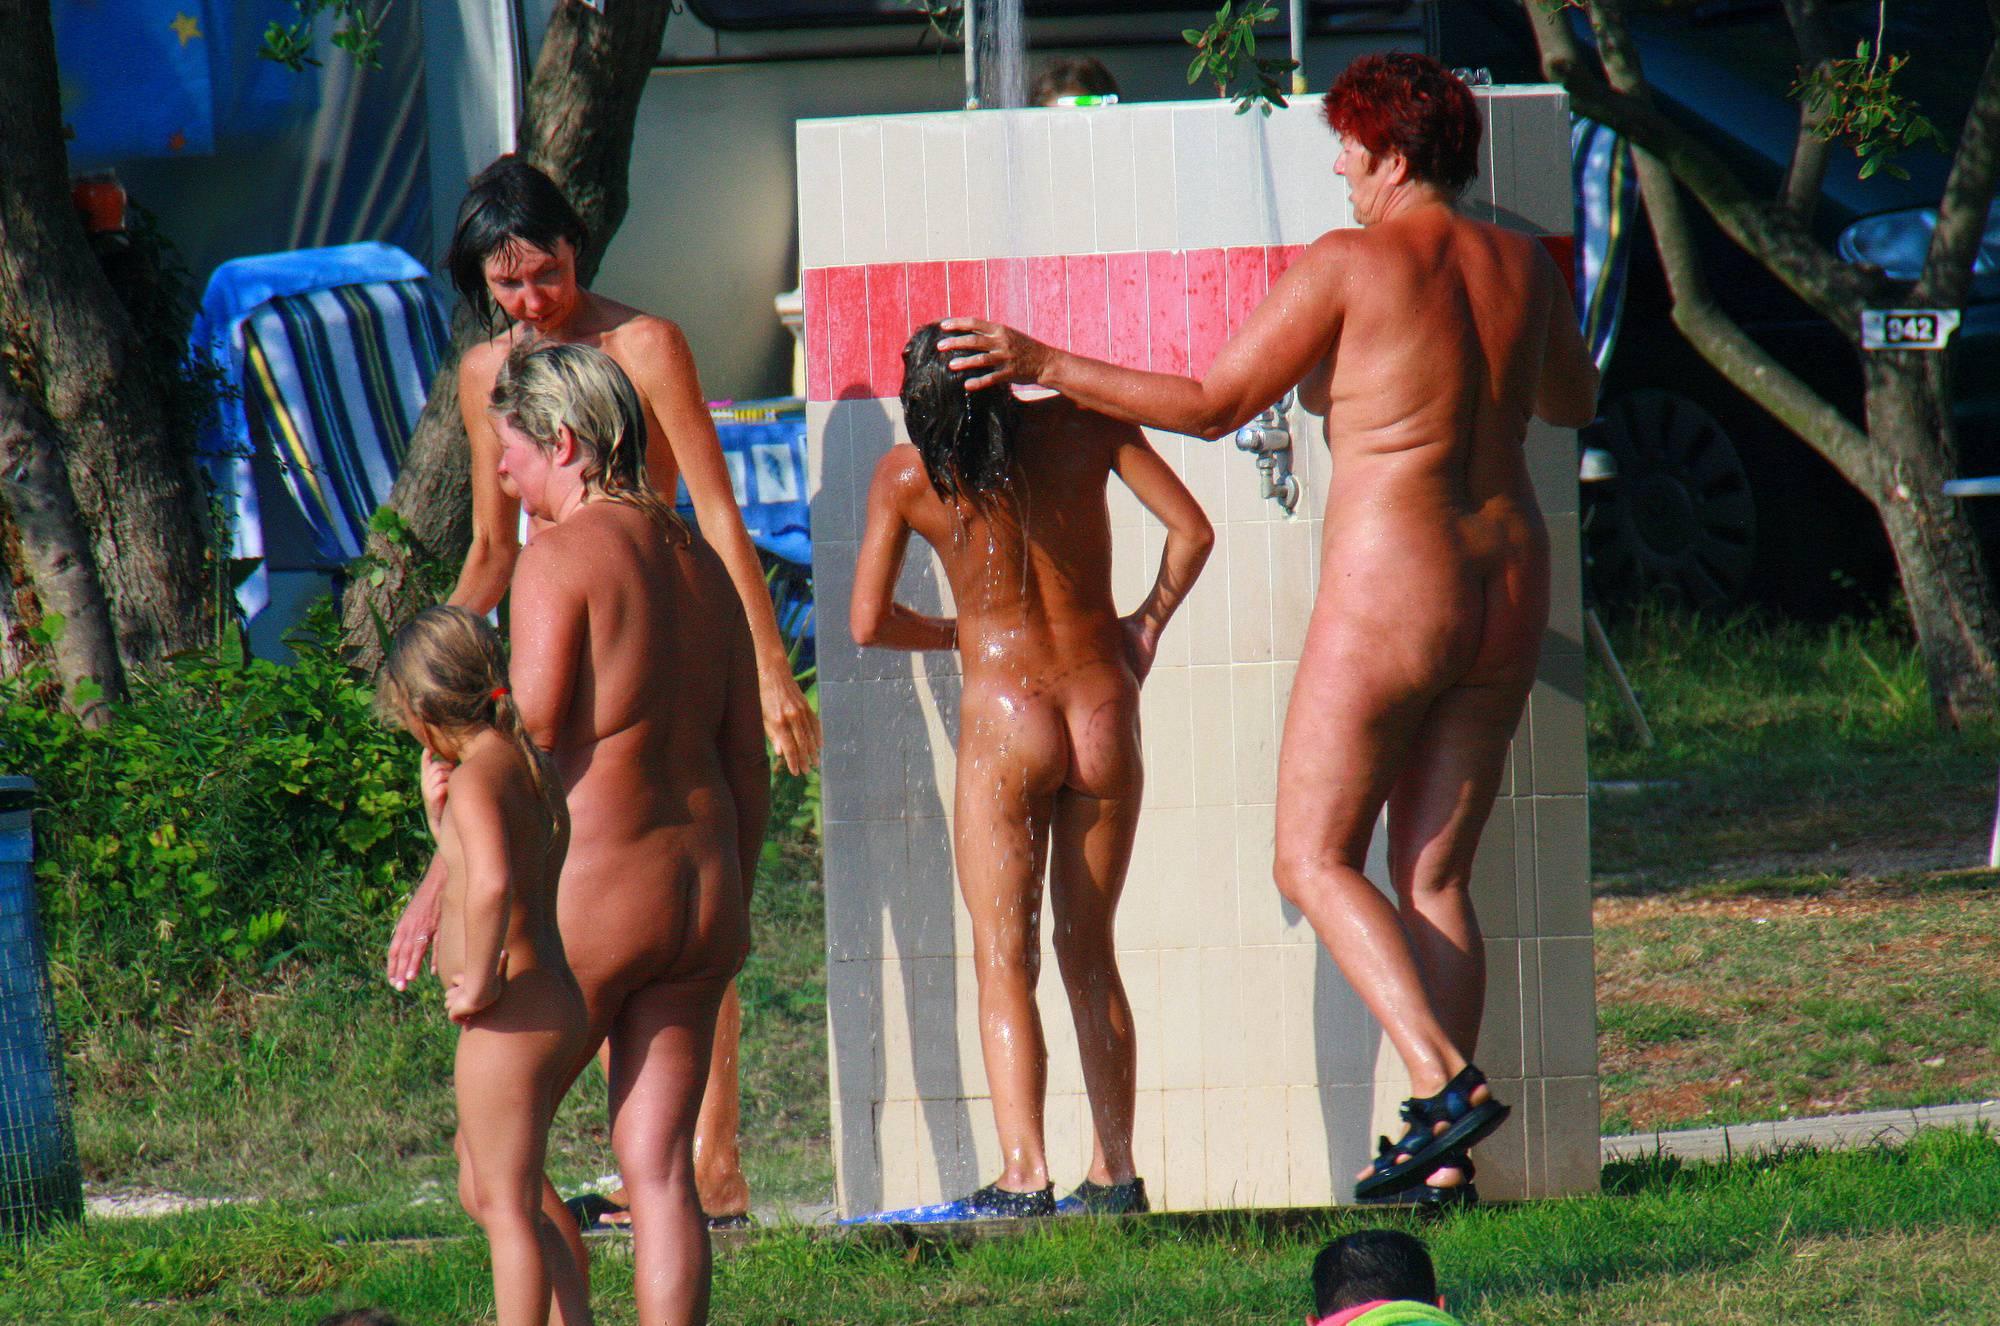 Purenudism Pics-Ula FKK Family Shower Site - 1